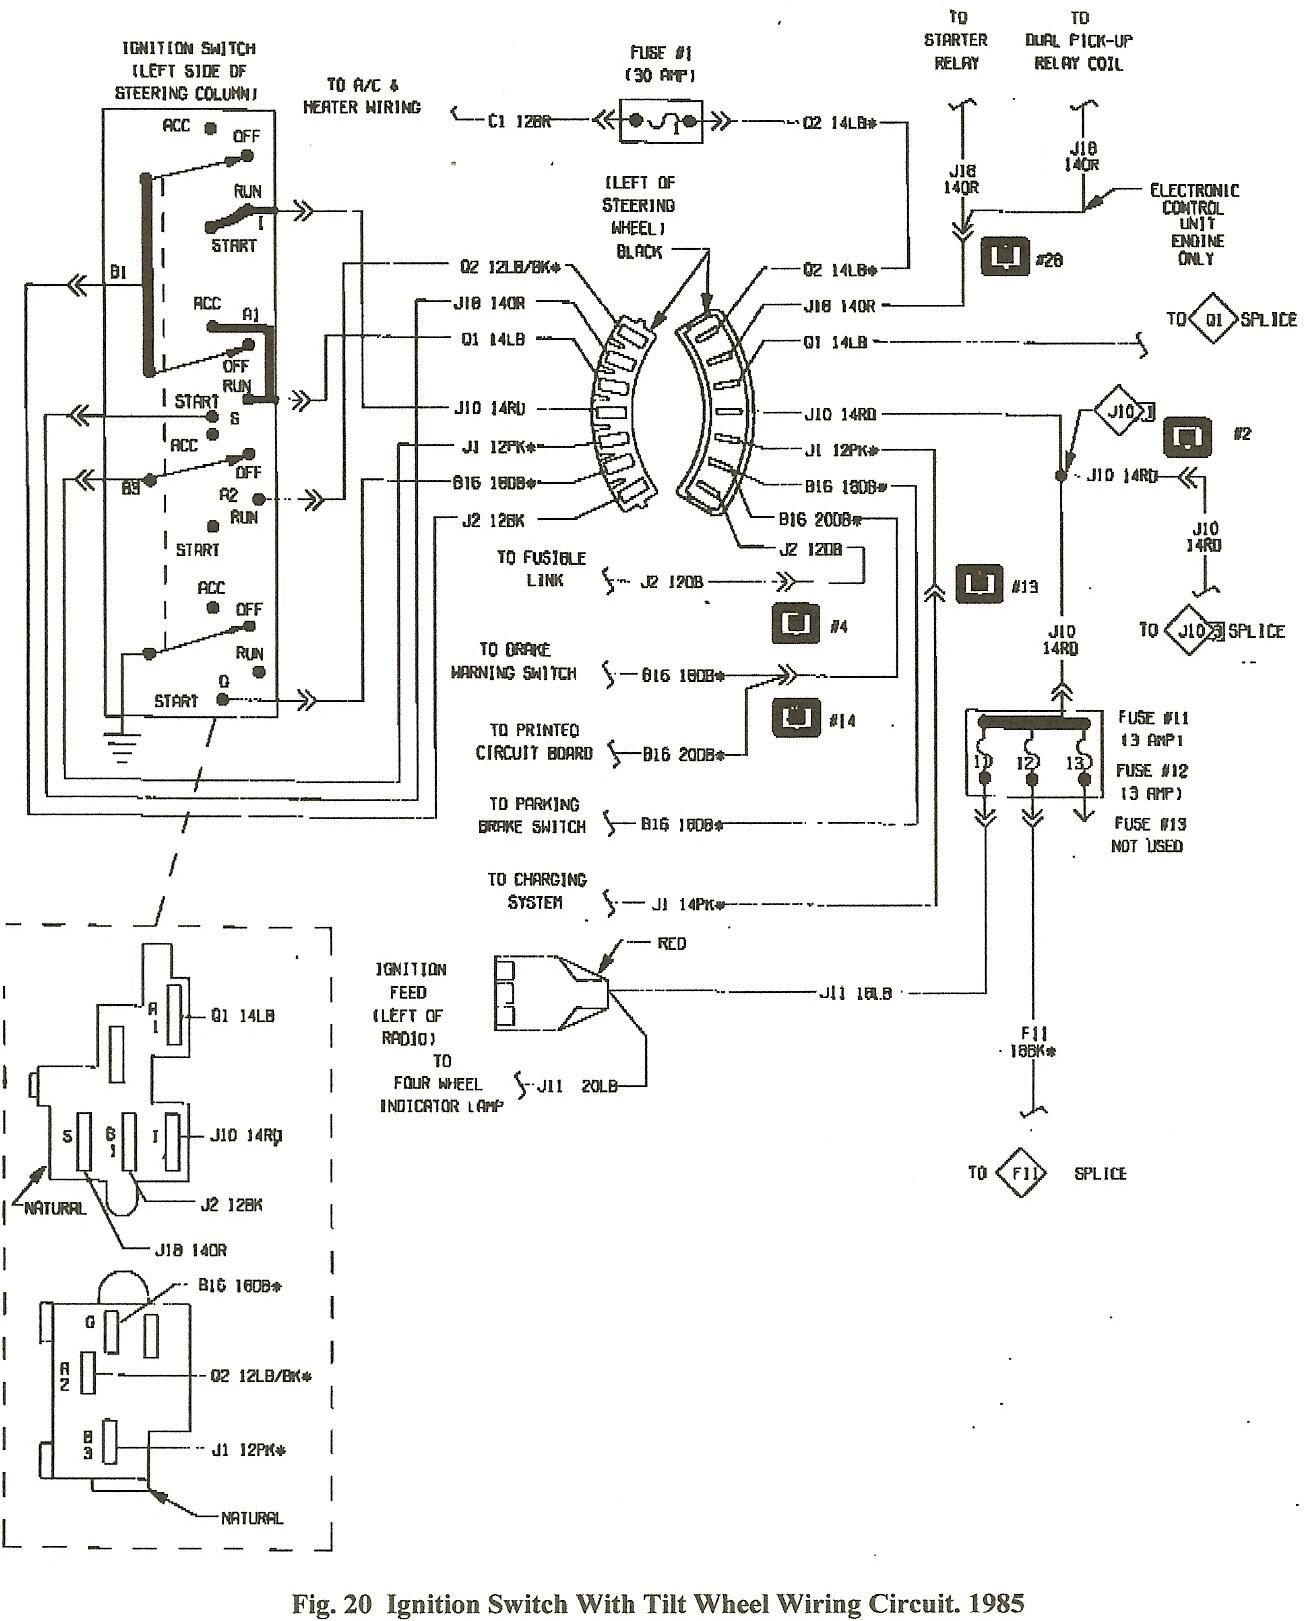 hight resolution of 1992 dodge dakota ignition system wiring diagram free download rh oasis dl co basic ignition wiring